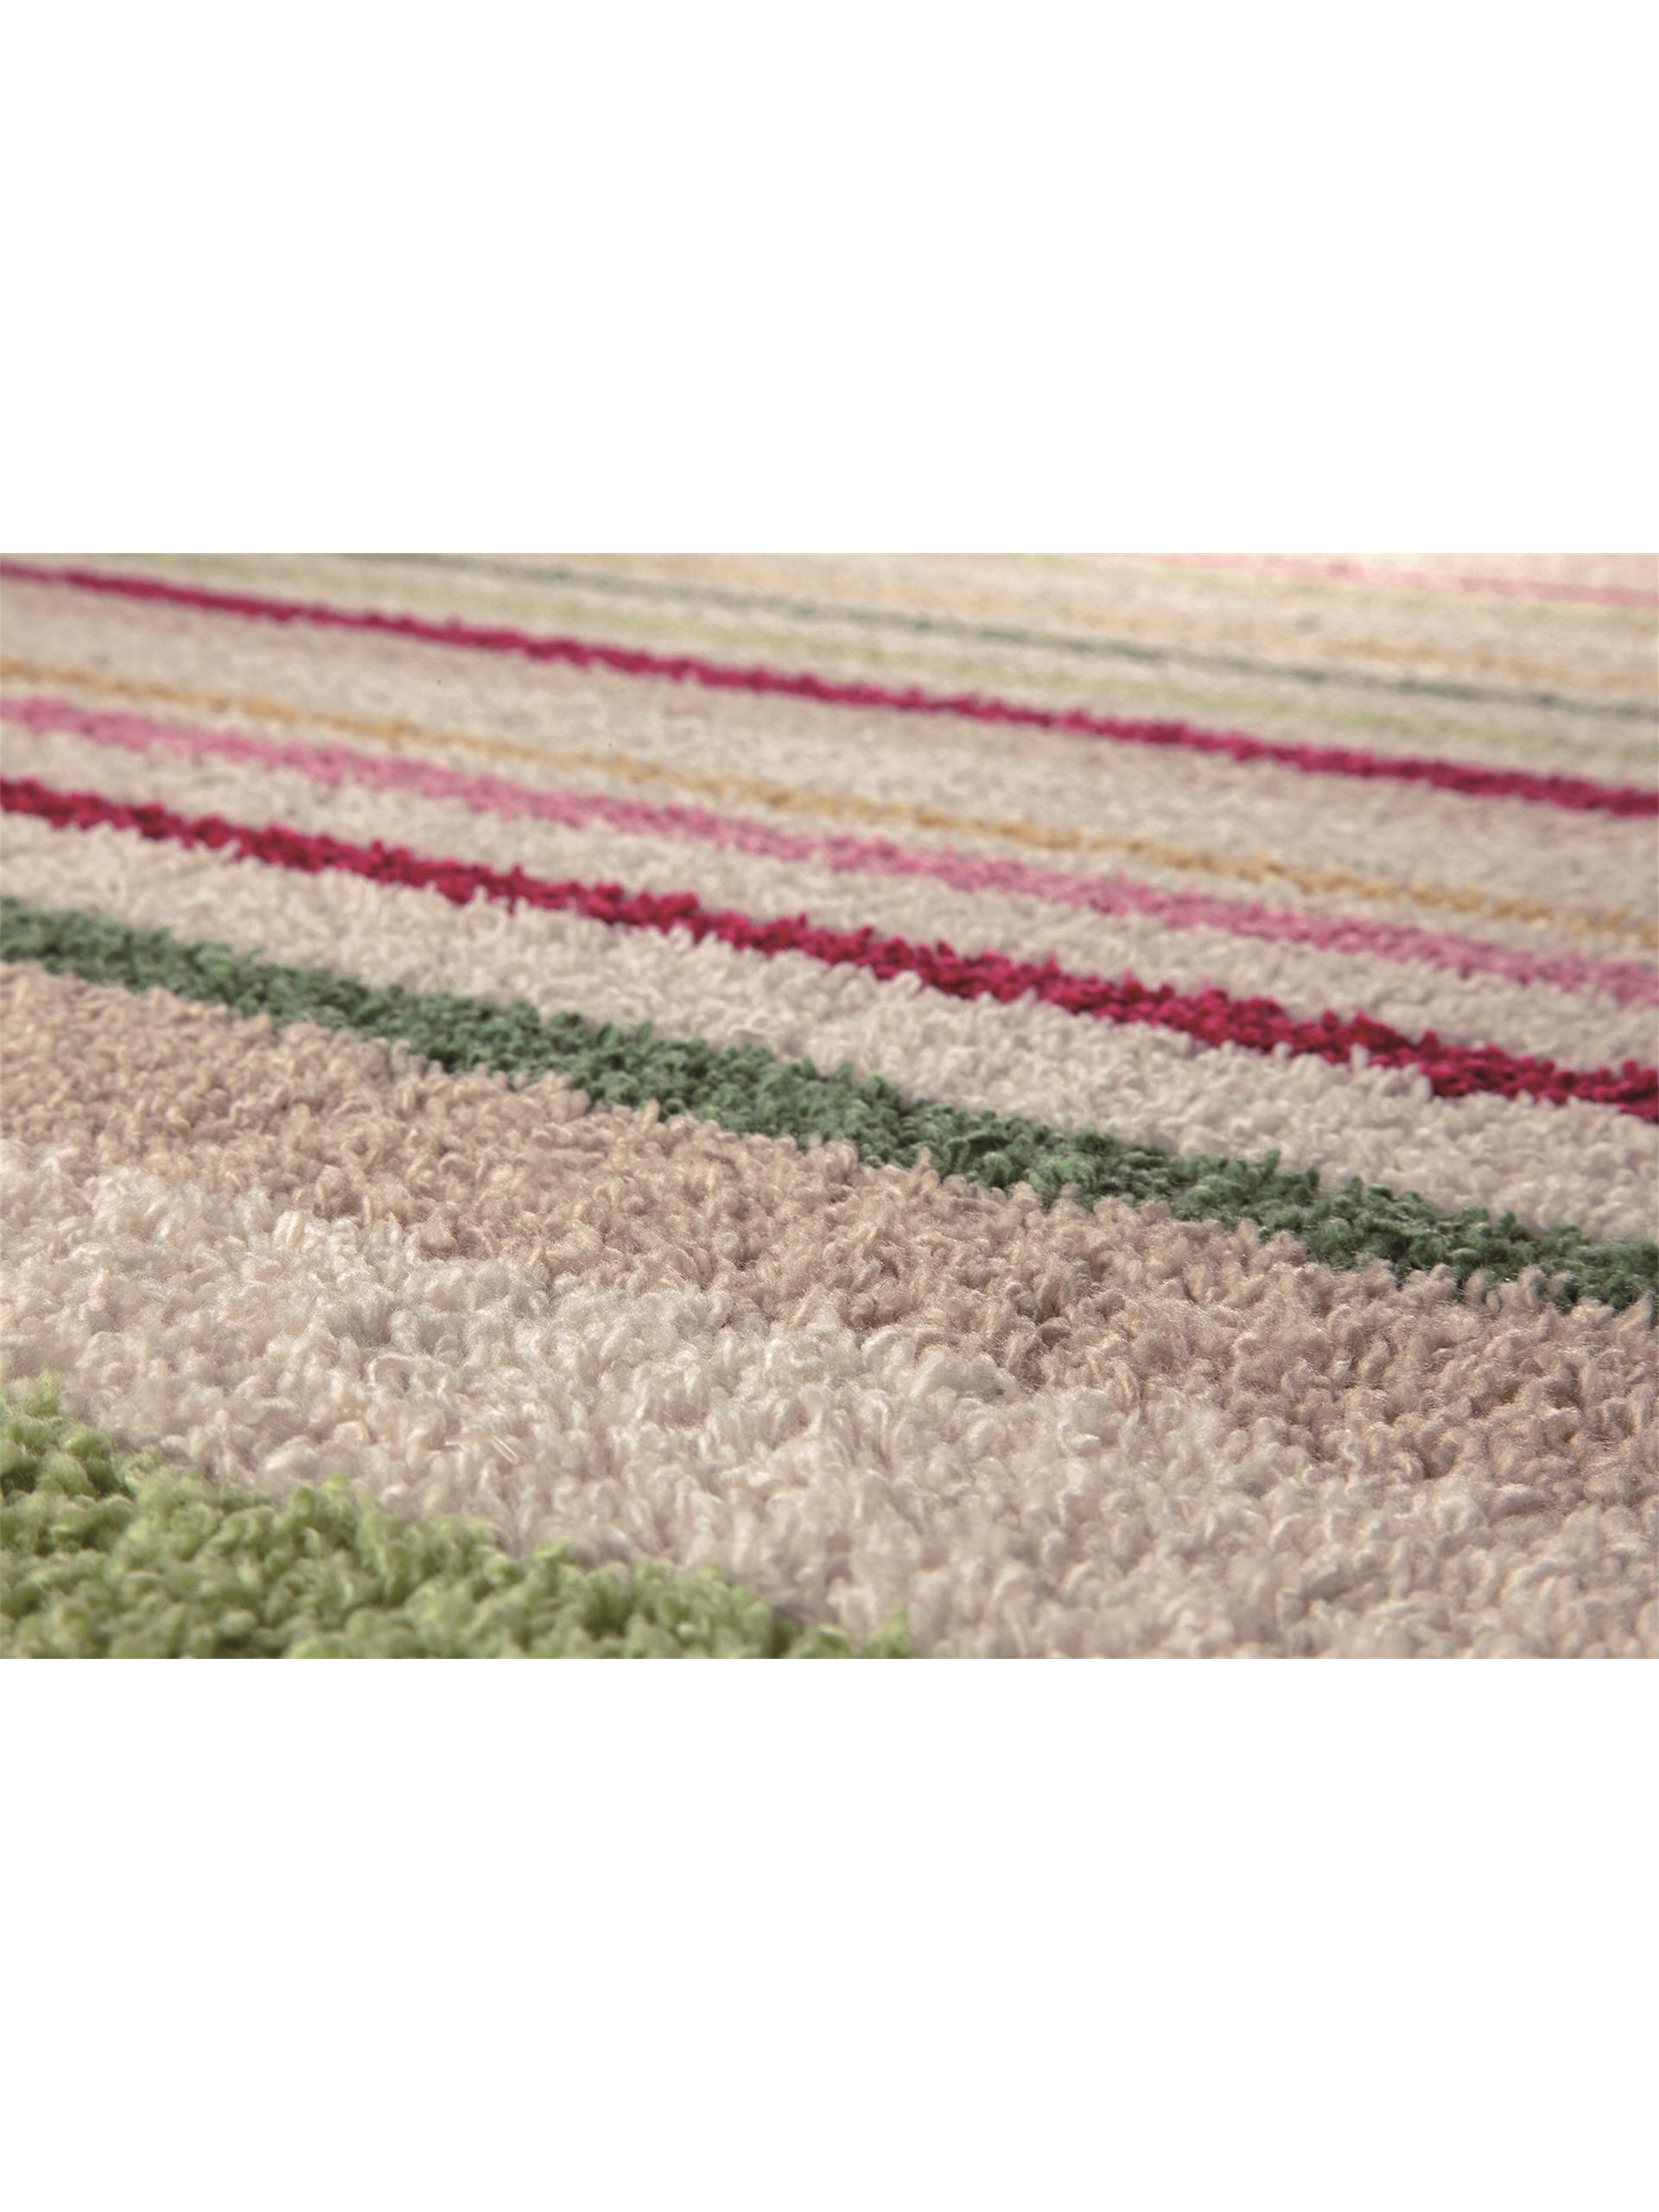 Esprit Kid's rug Funny Stripes Beige 170x240 cm